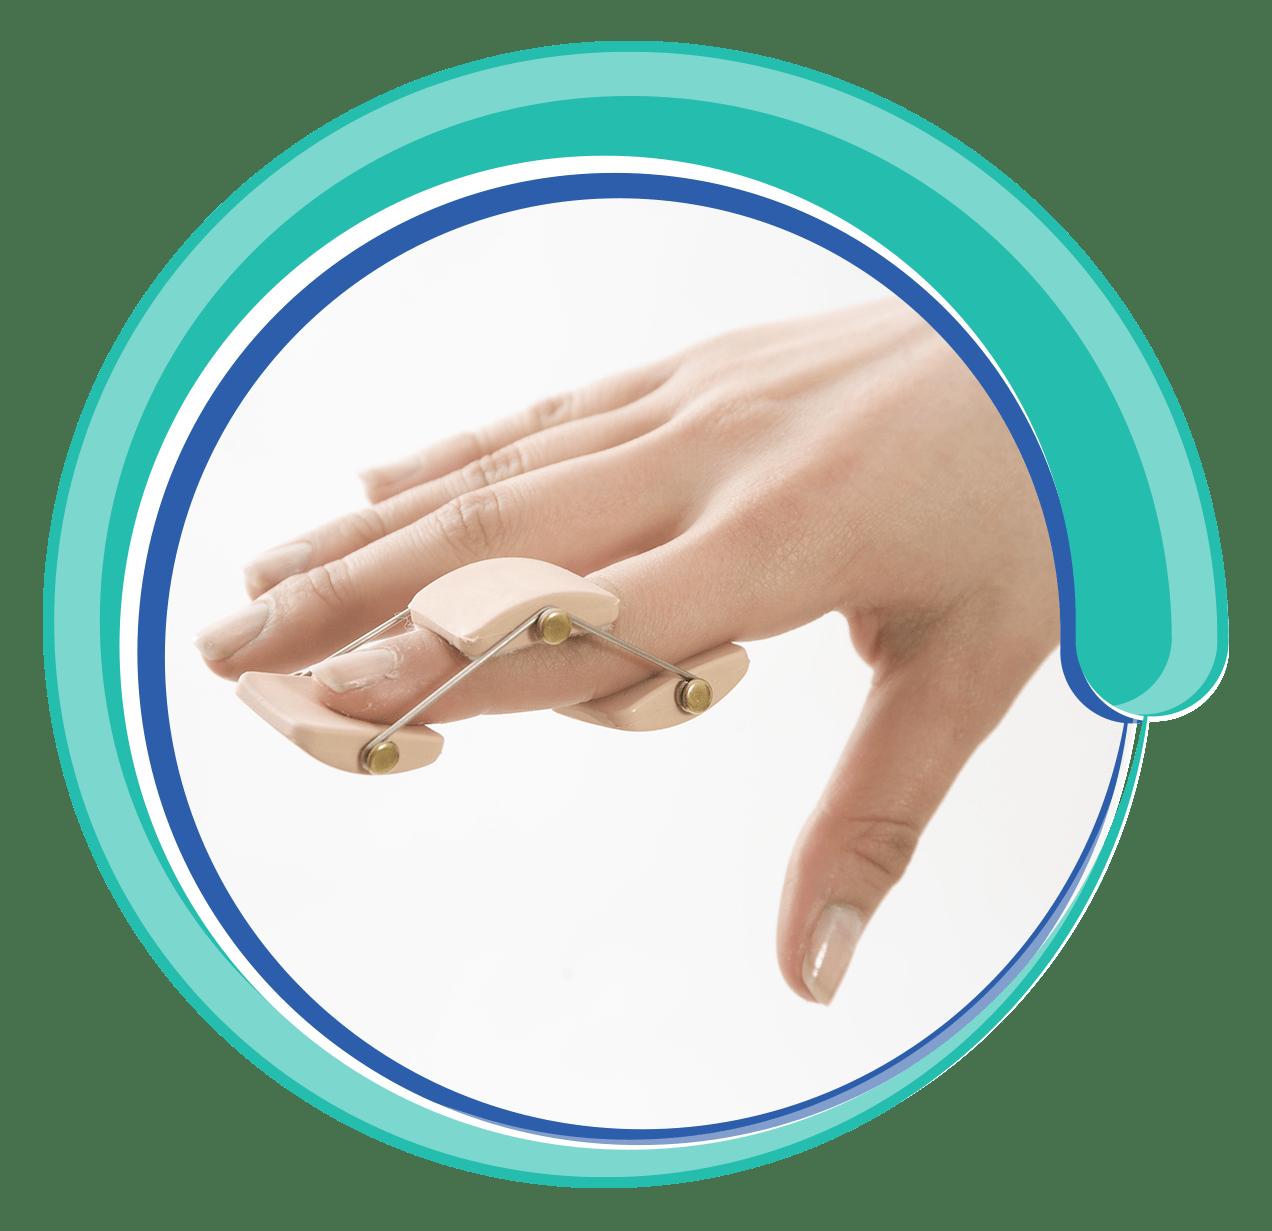 Handshake clipart skin to skin. Finger hand wrist splintsrayatgrup